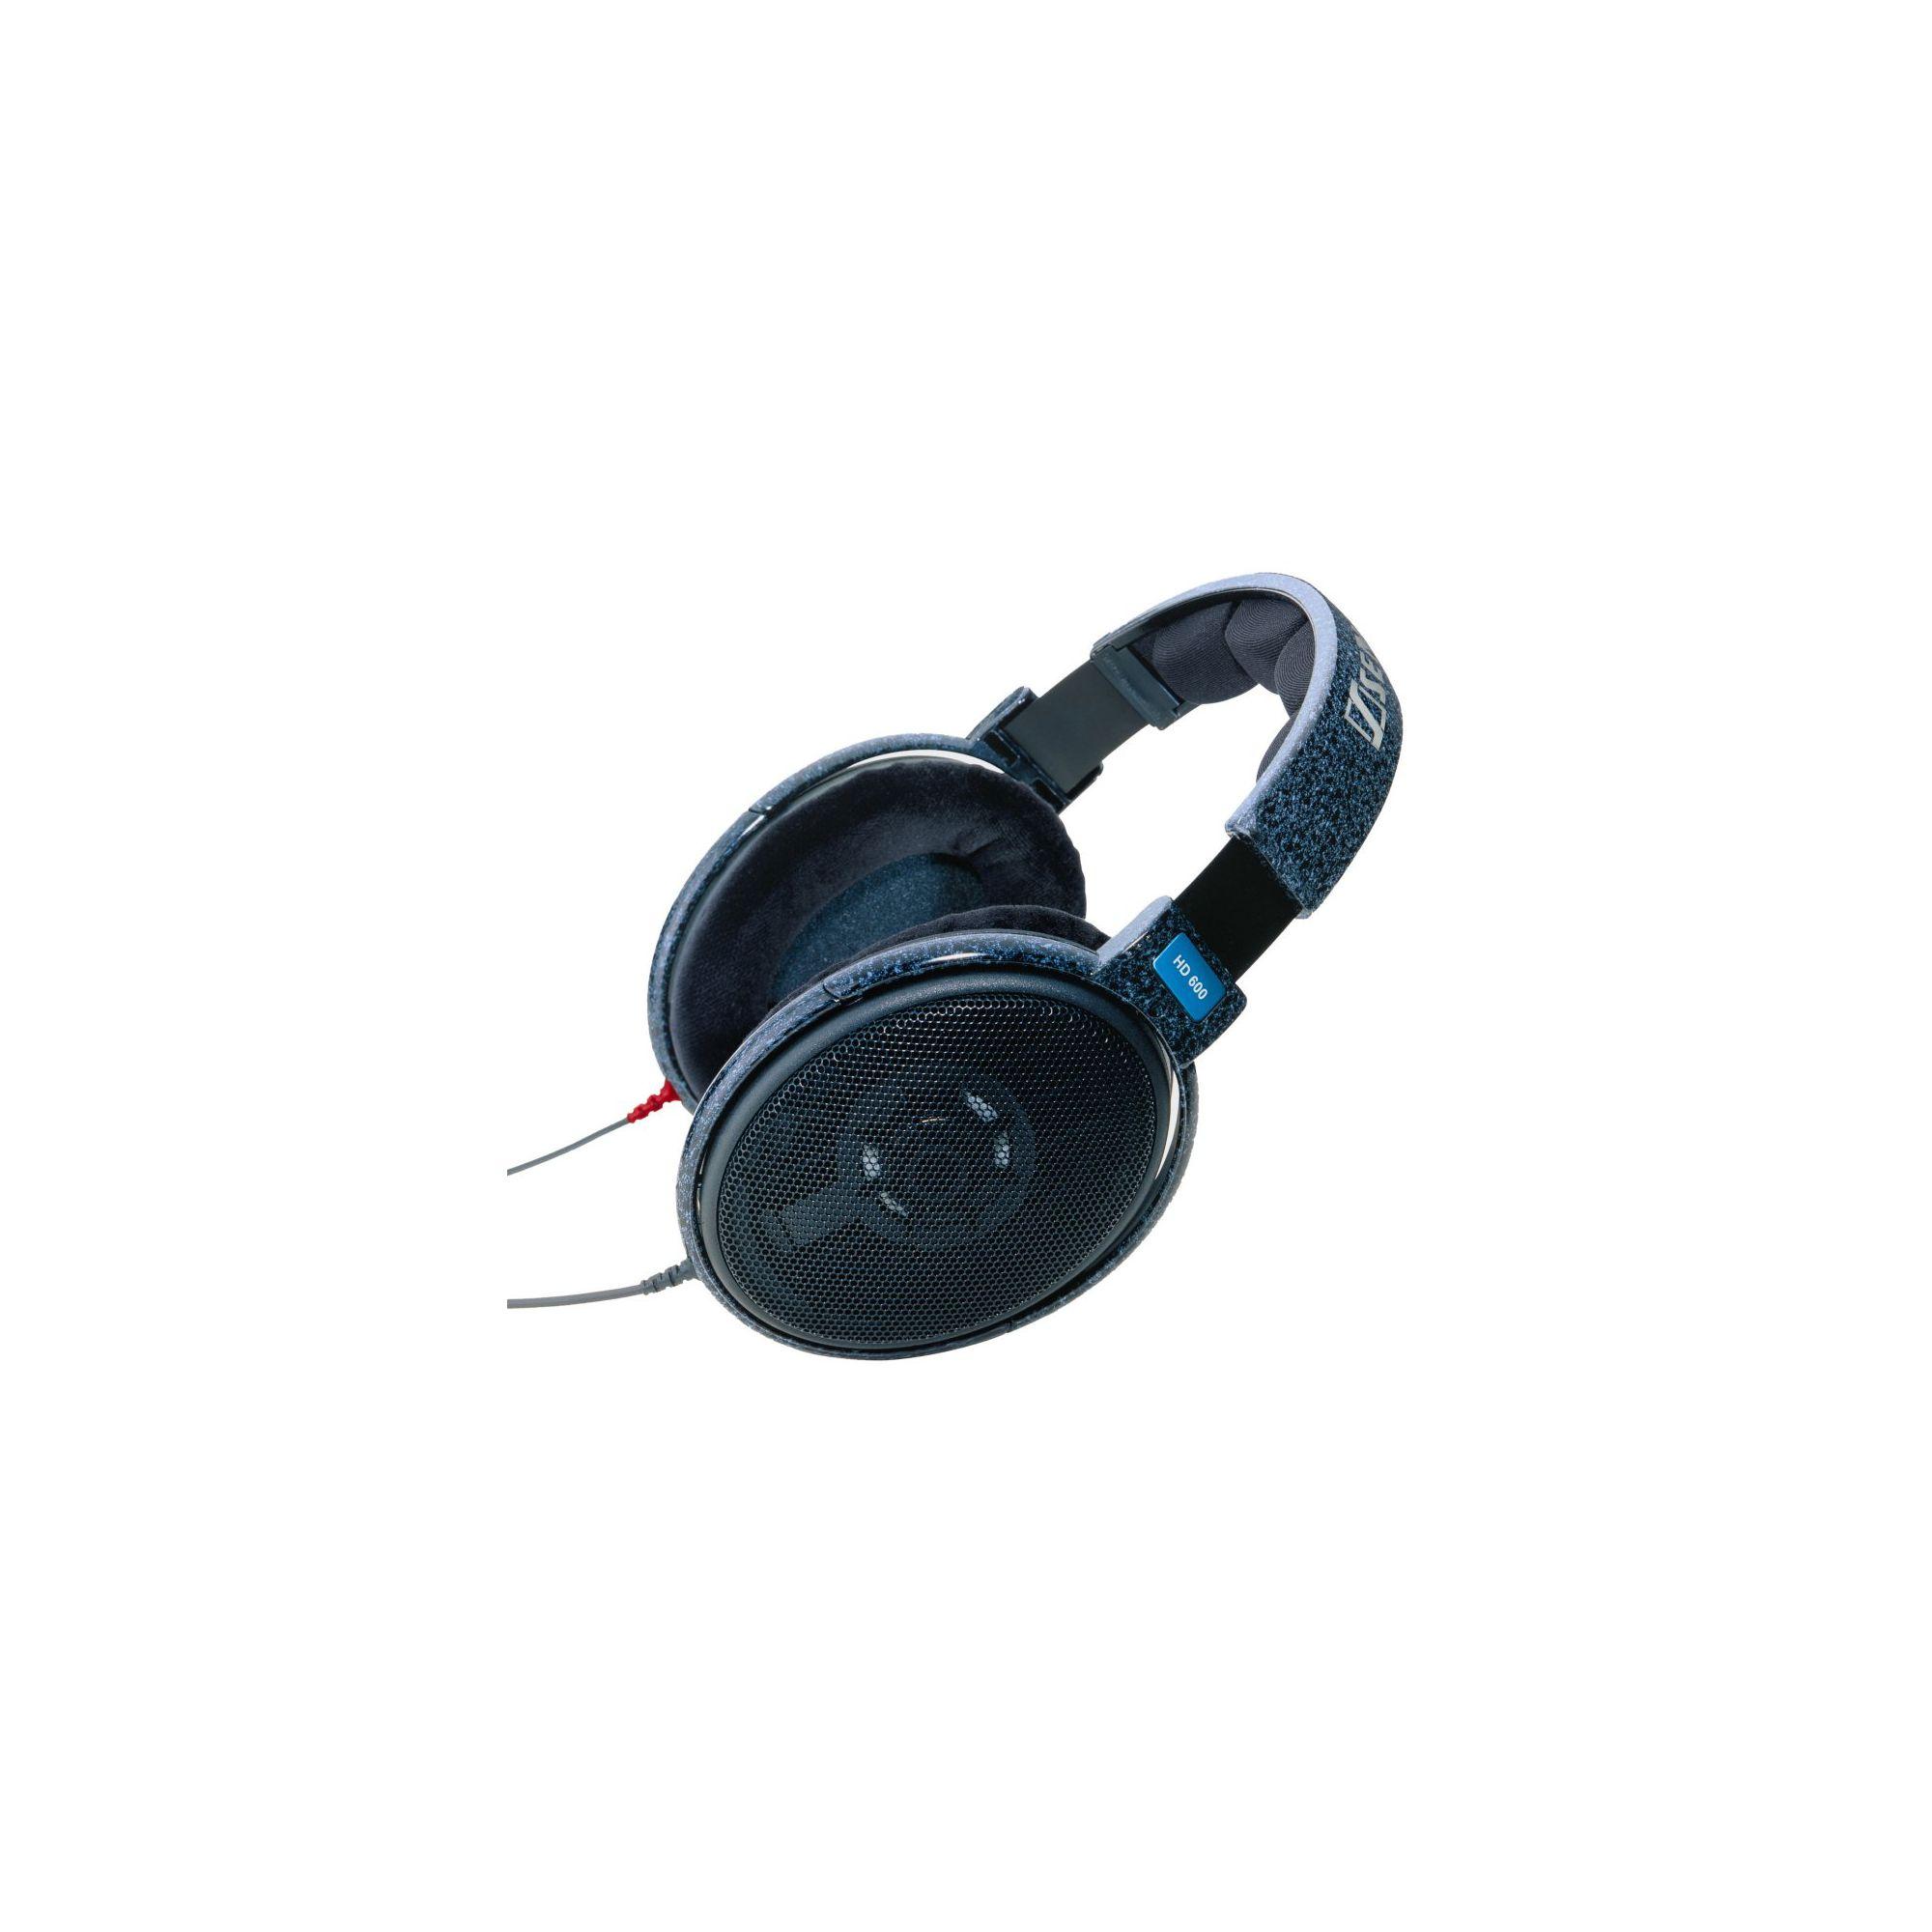 SENNHEISER HD600 AVANTGARDE HEADPHONES at Tesco Direct